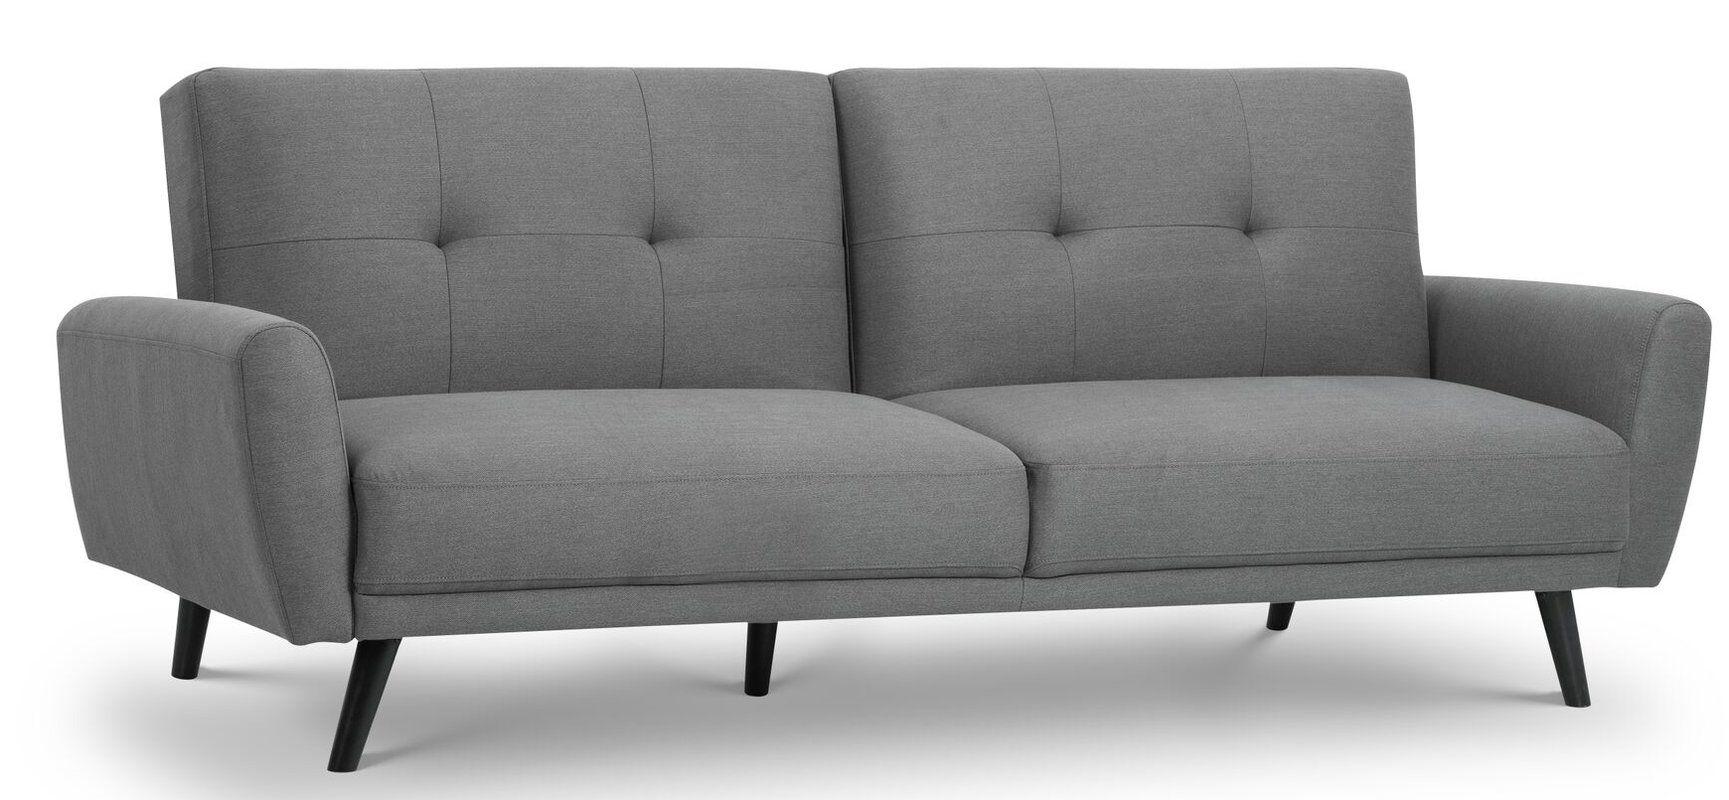 Delphinus 3 Seater Futon Sofa